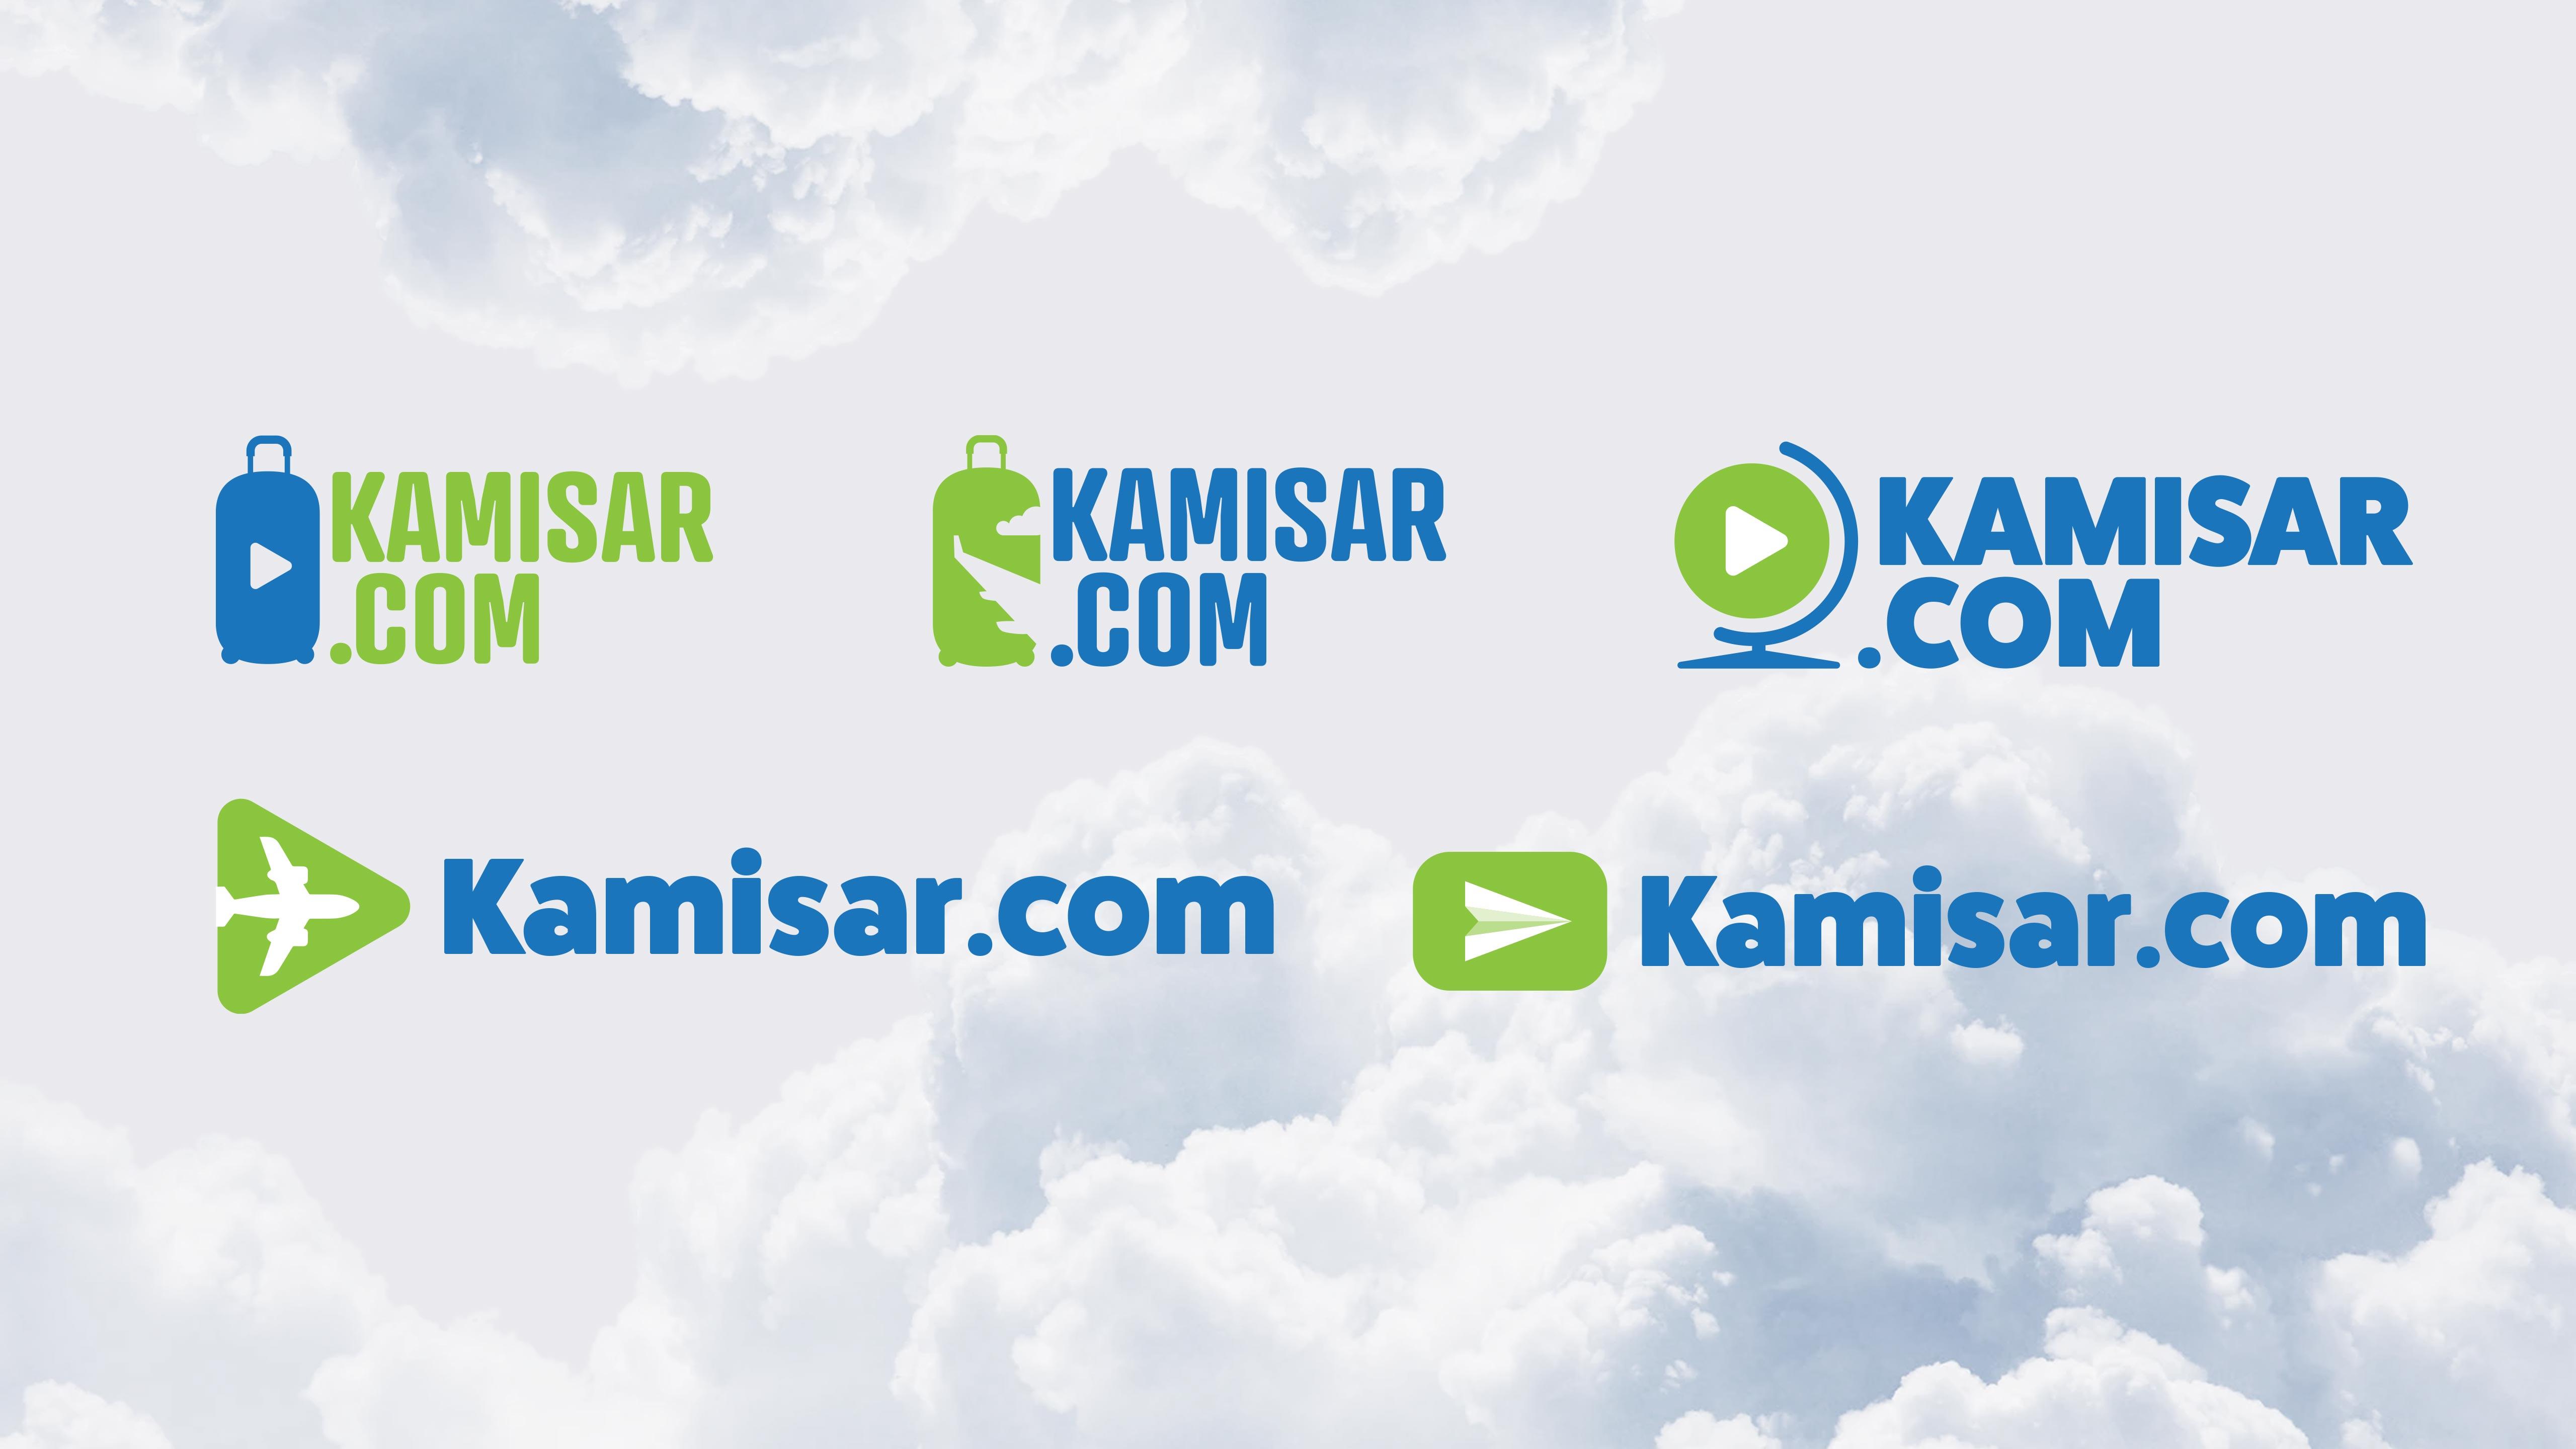 Kamisar.com